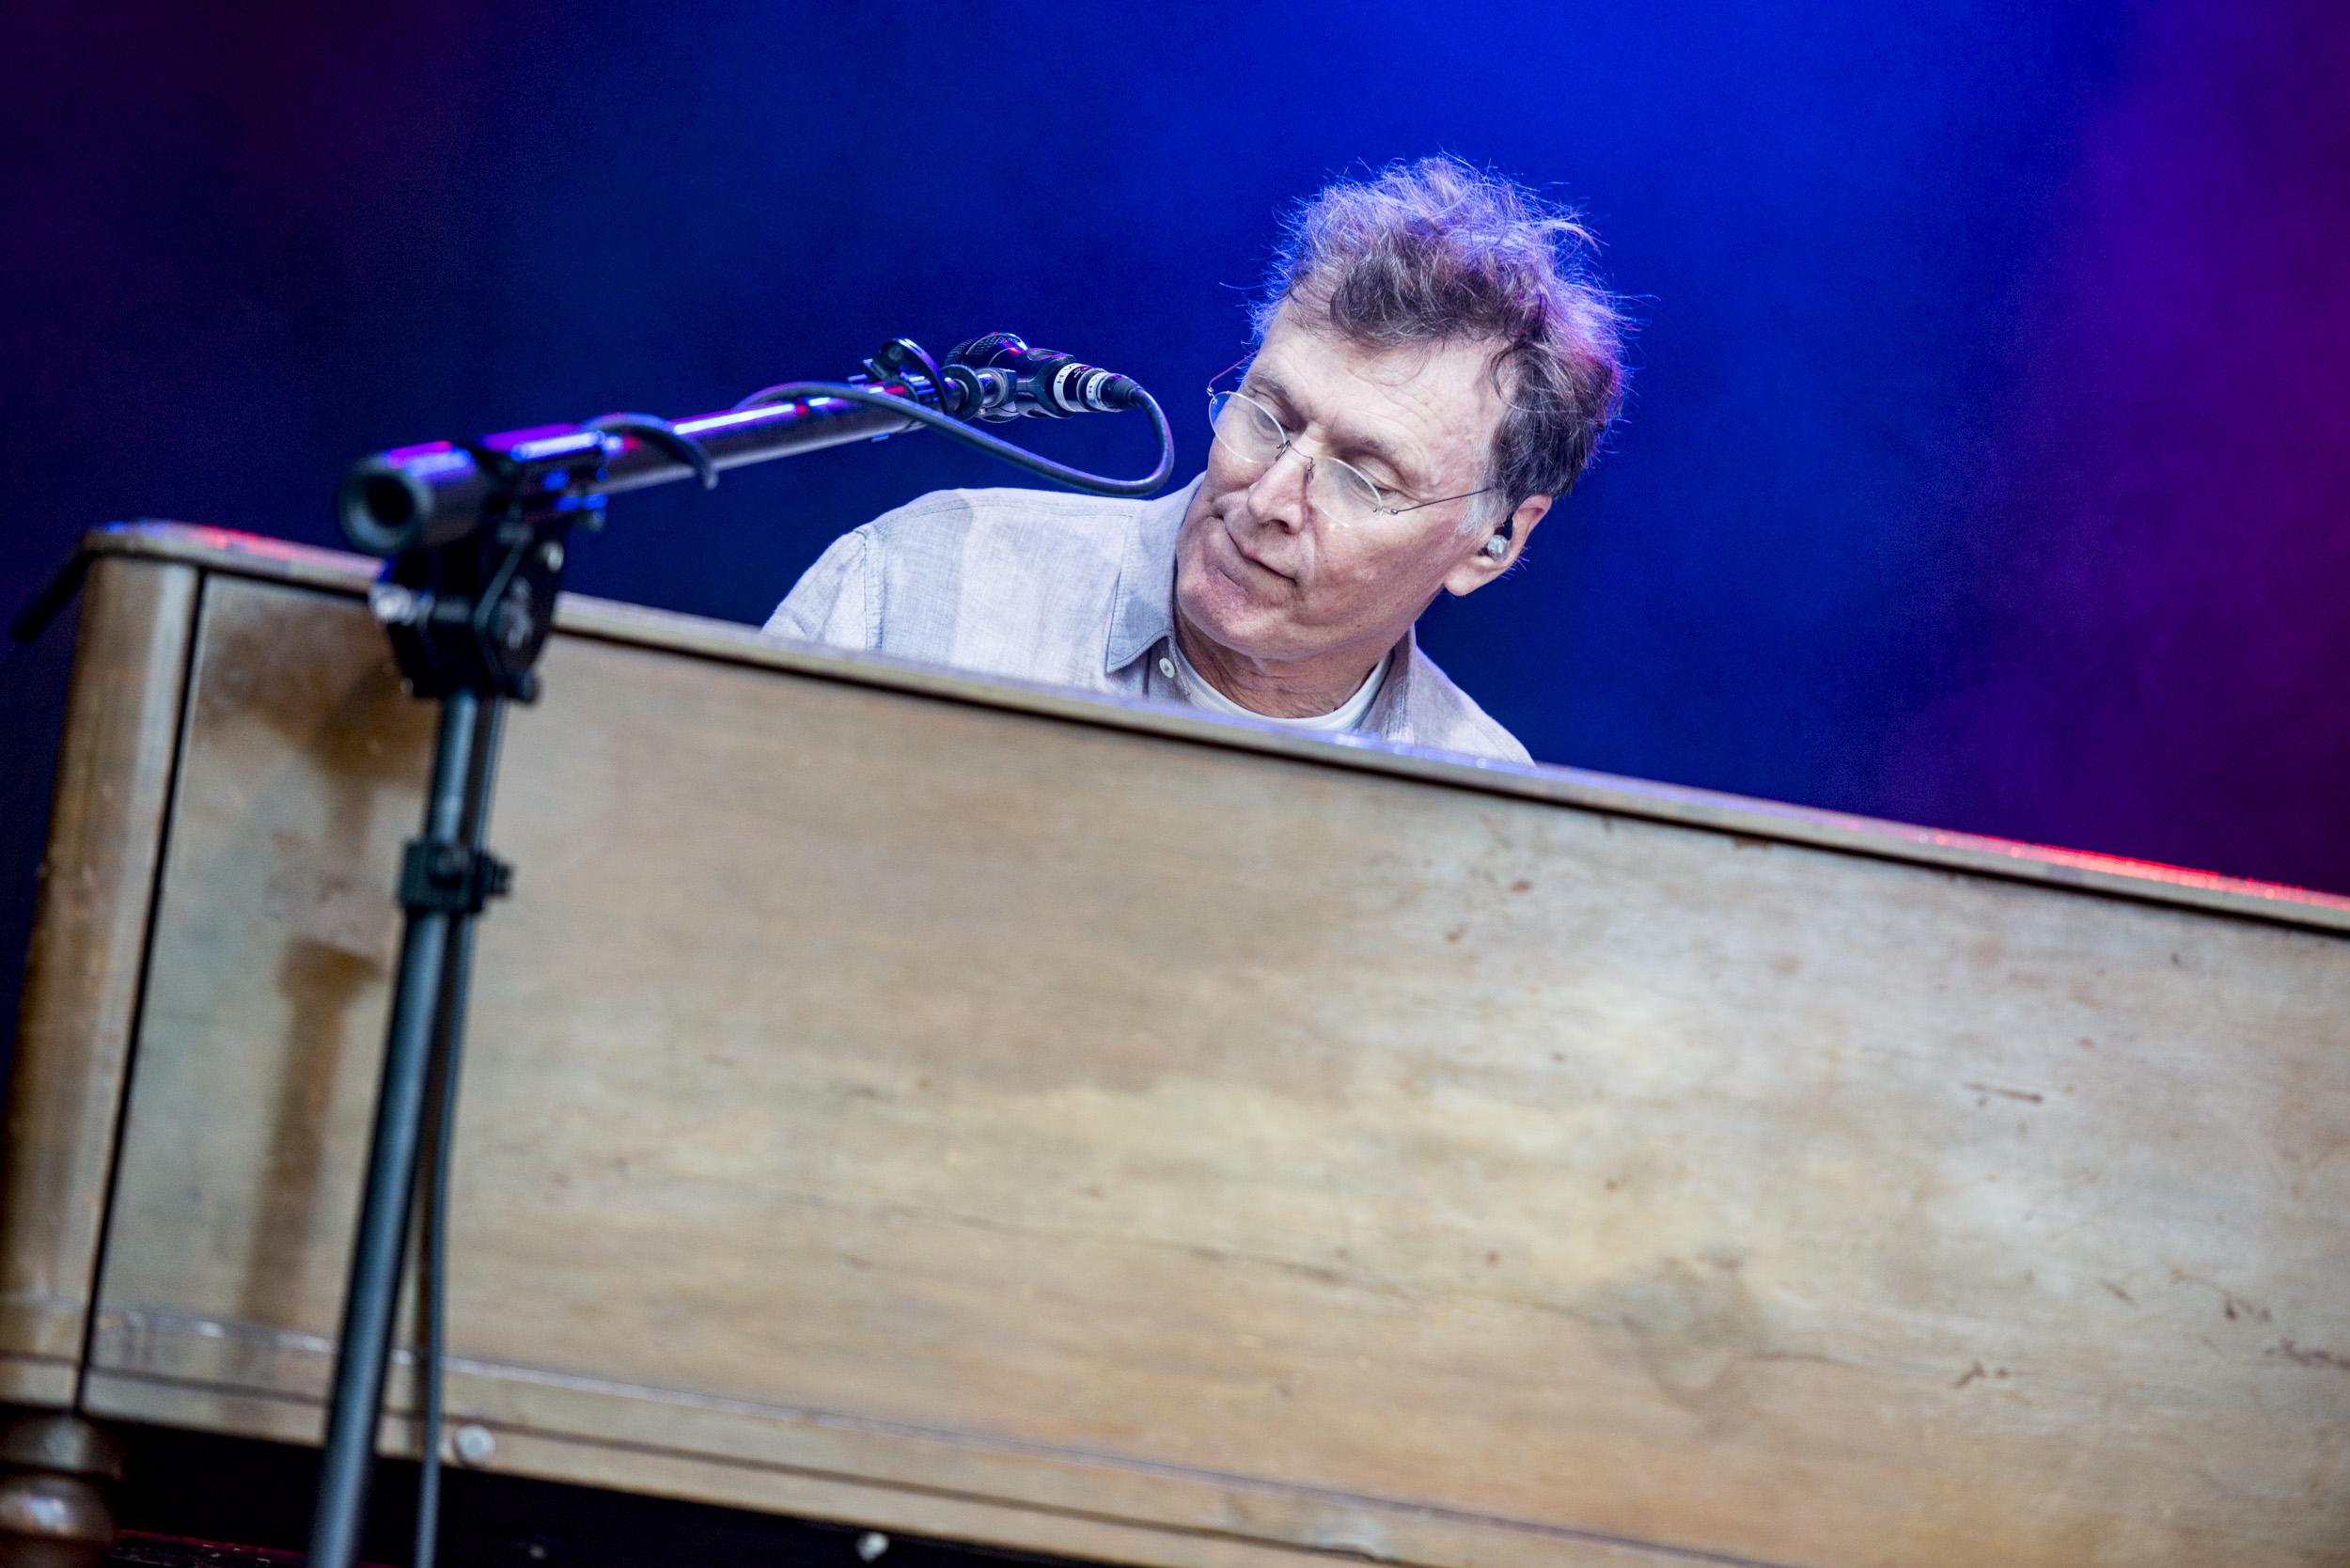 Steve Winwood @ Cactusfestival 2017, Dag 2 (Nick De Baerdemaeker)